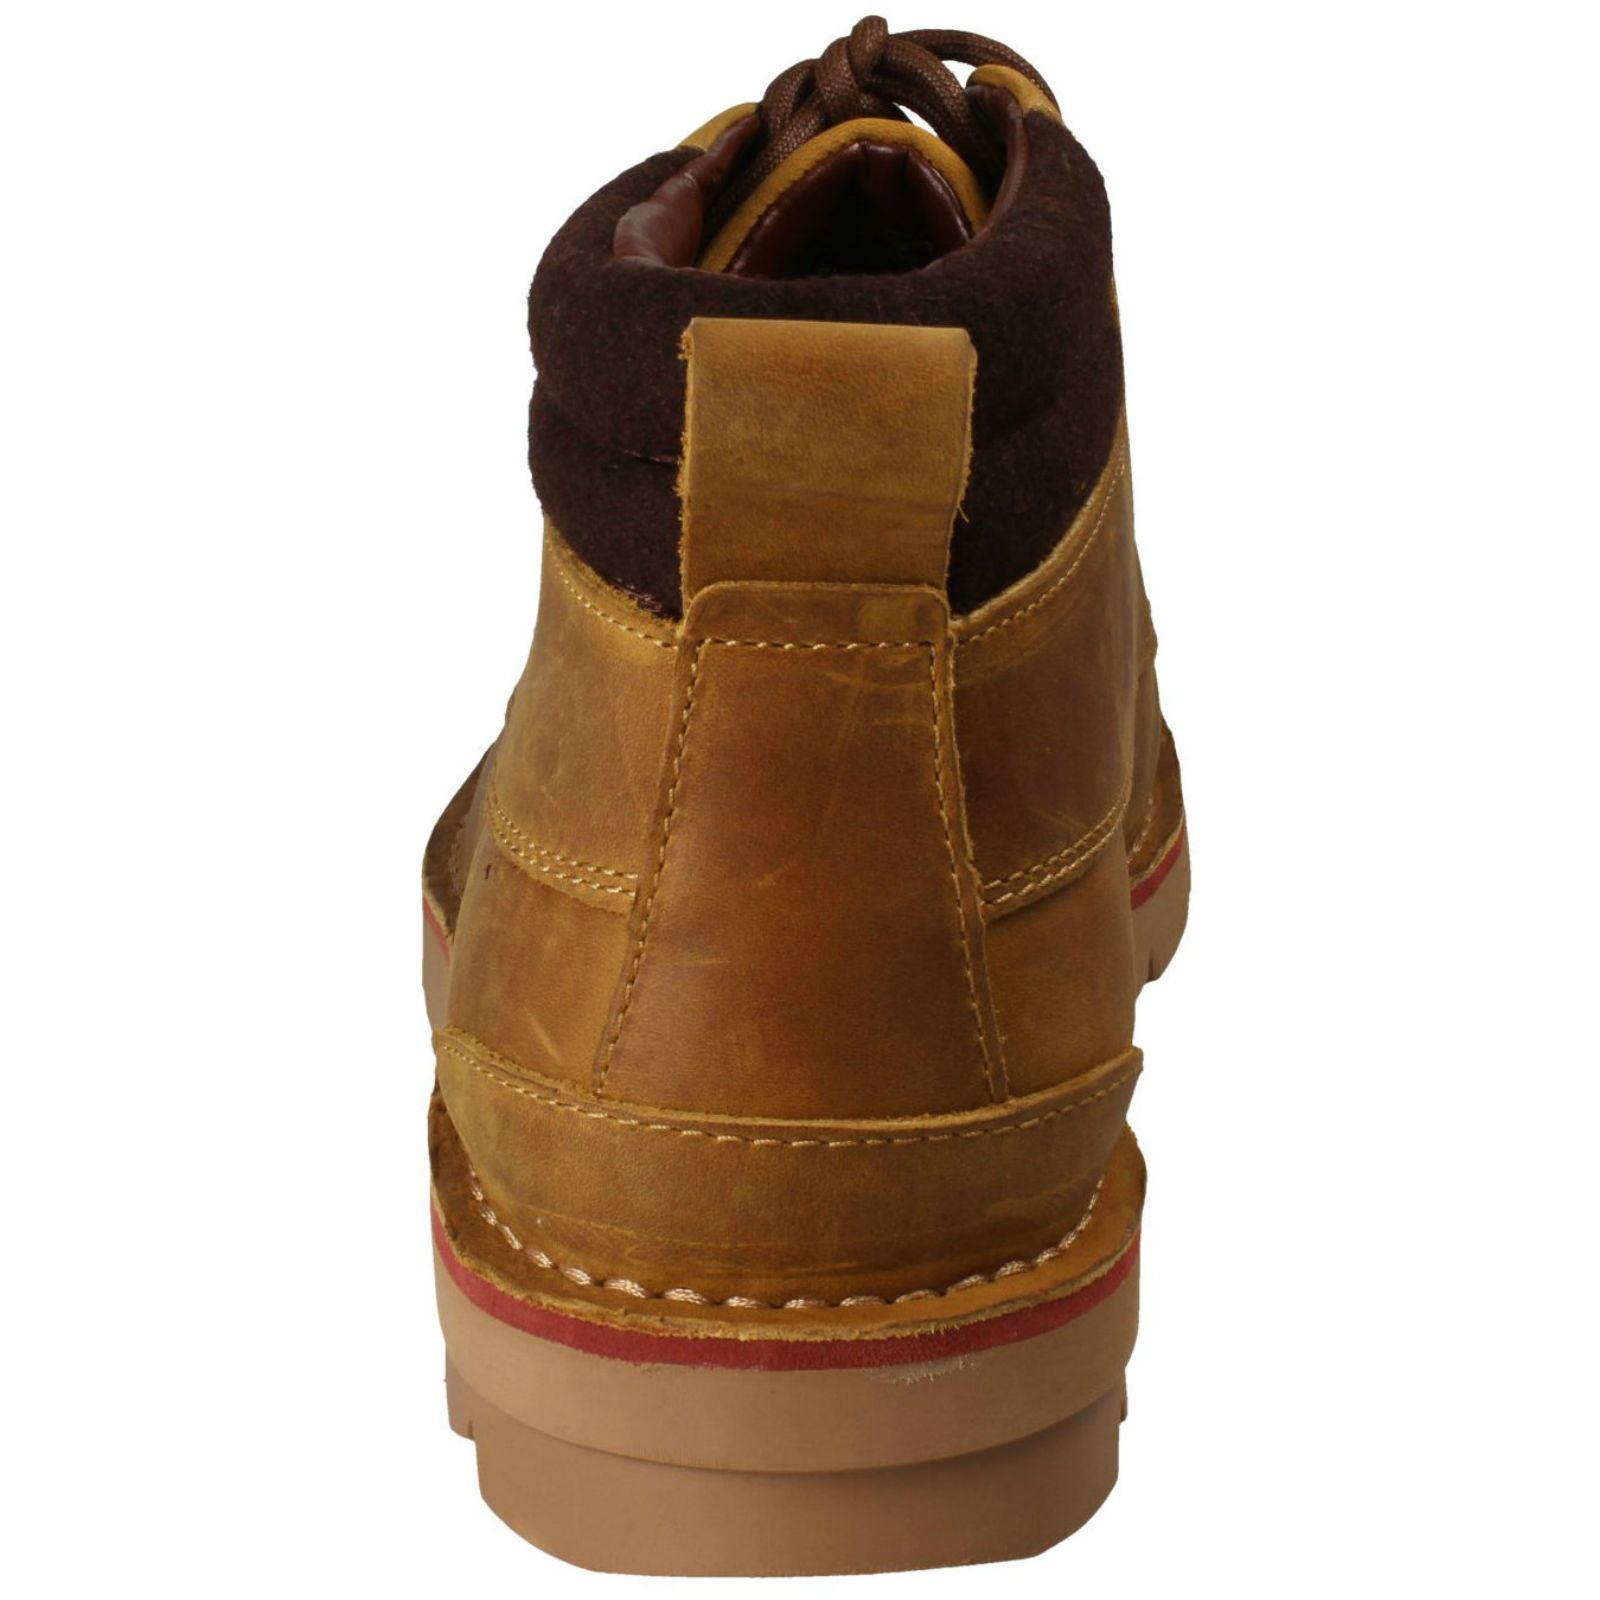 Mens Clarks Casual Boots *Varick Heal*